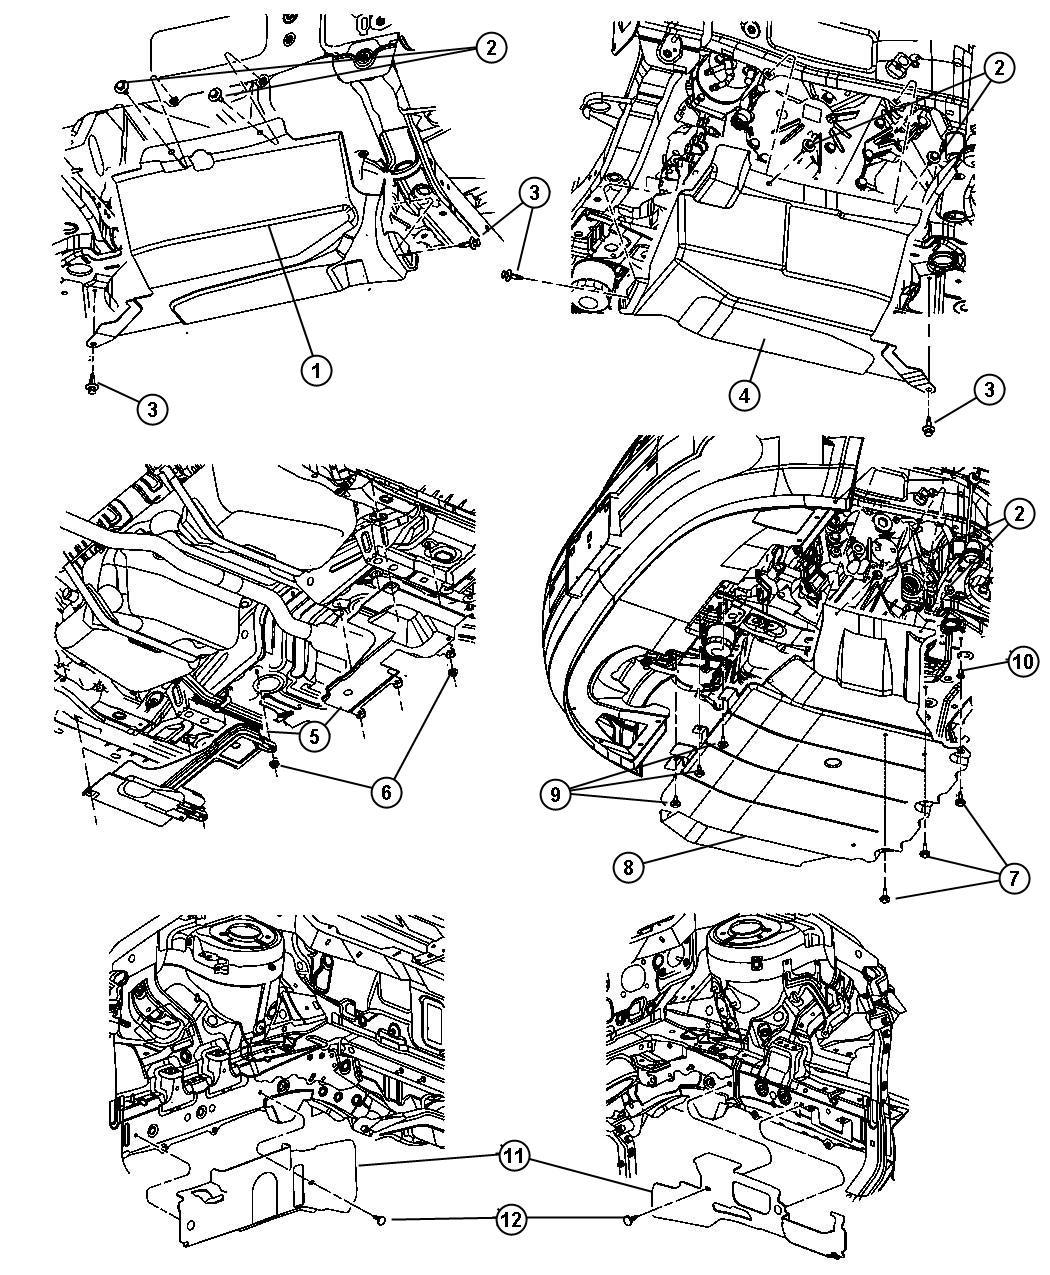 Service manual [2007 Dodge Caliber Engine Removal Process